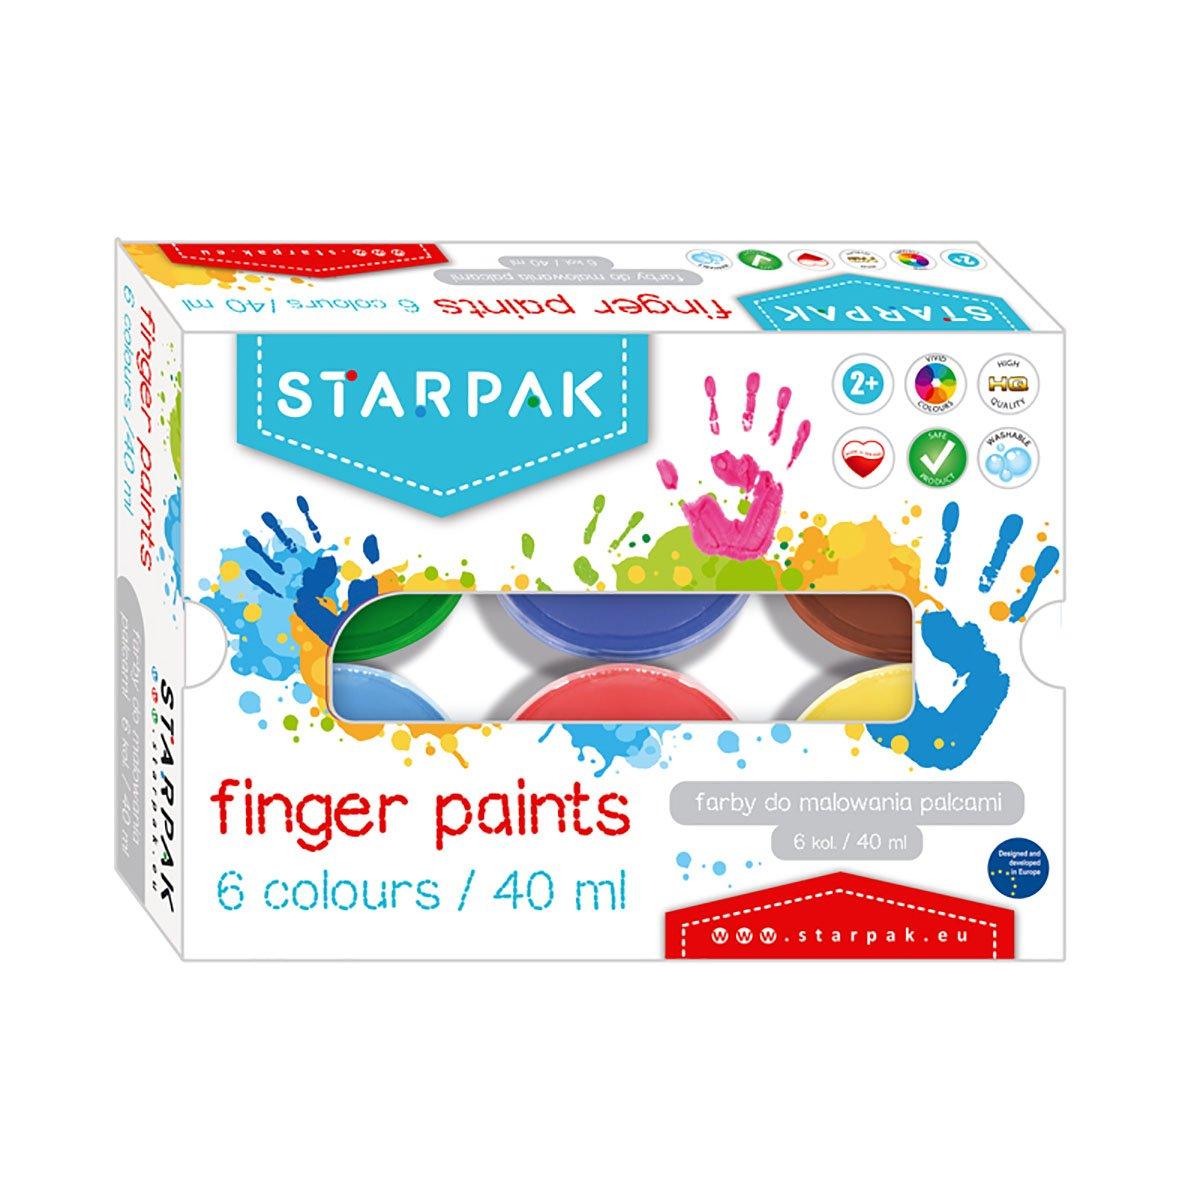 Finger paints cu 6 culori Starpak, 40 ml